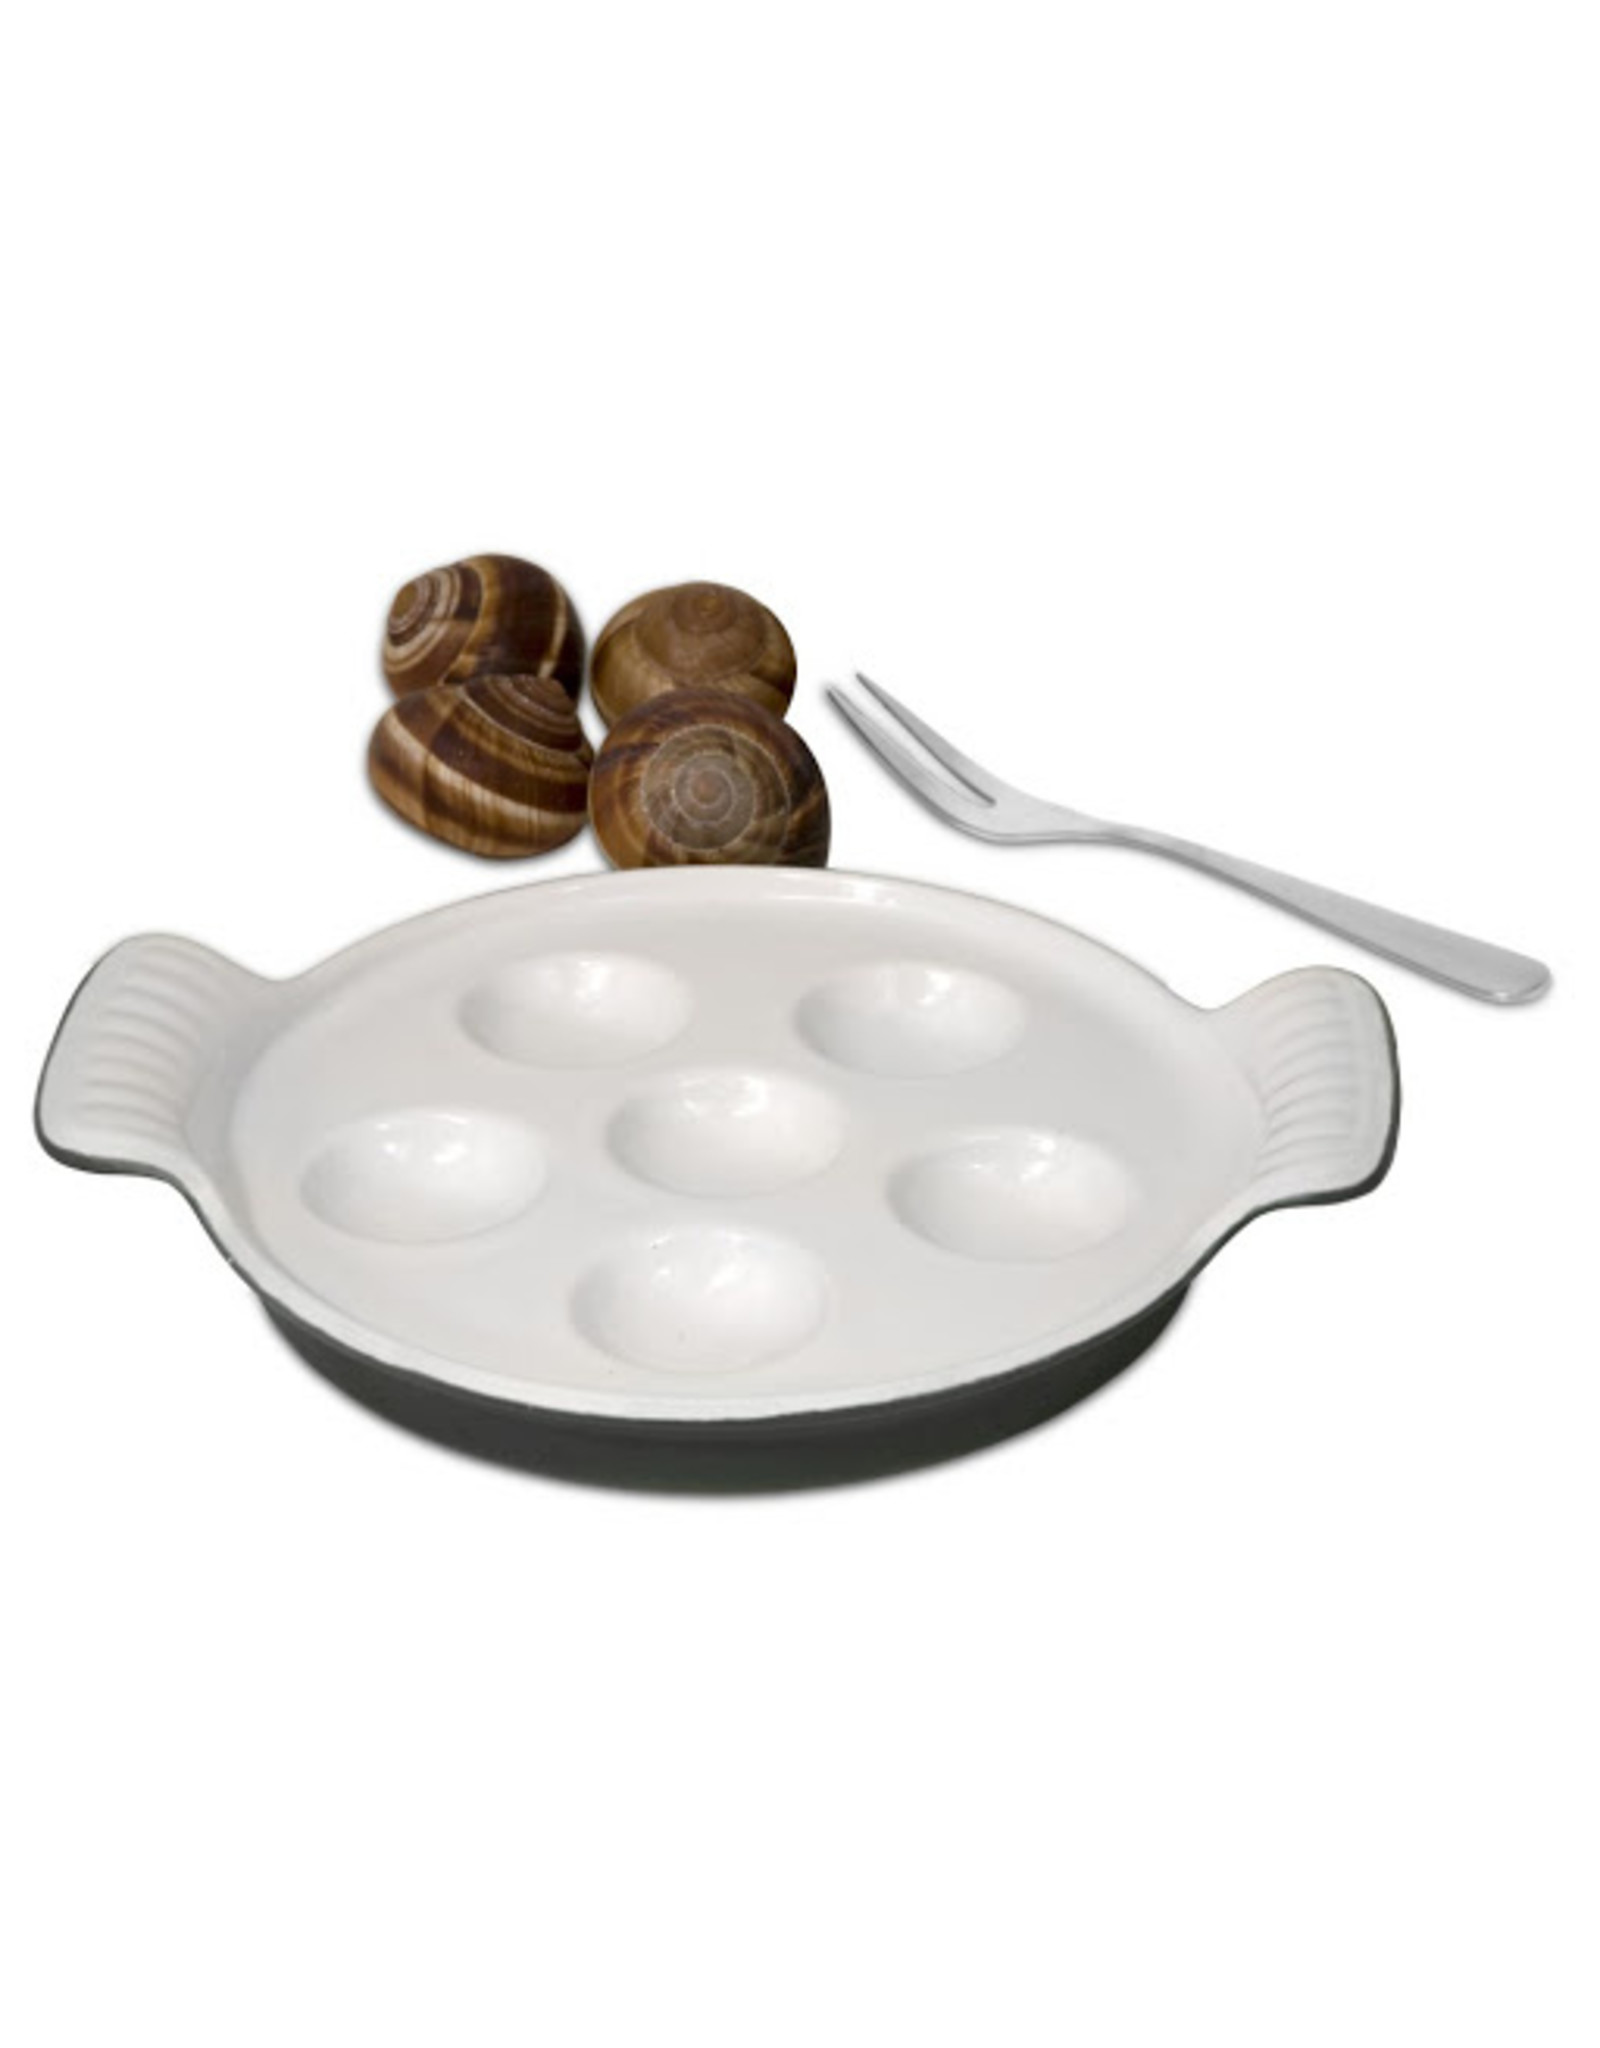 FT Cast Iron Escargot Dish